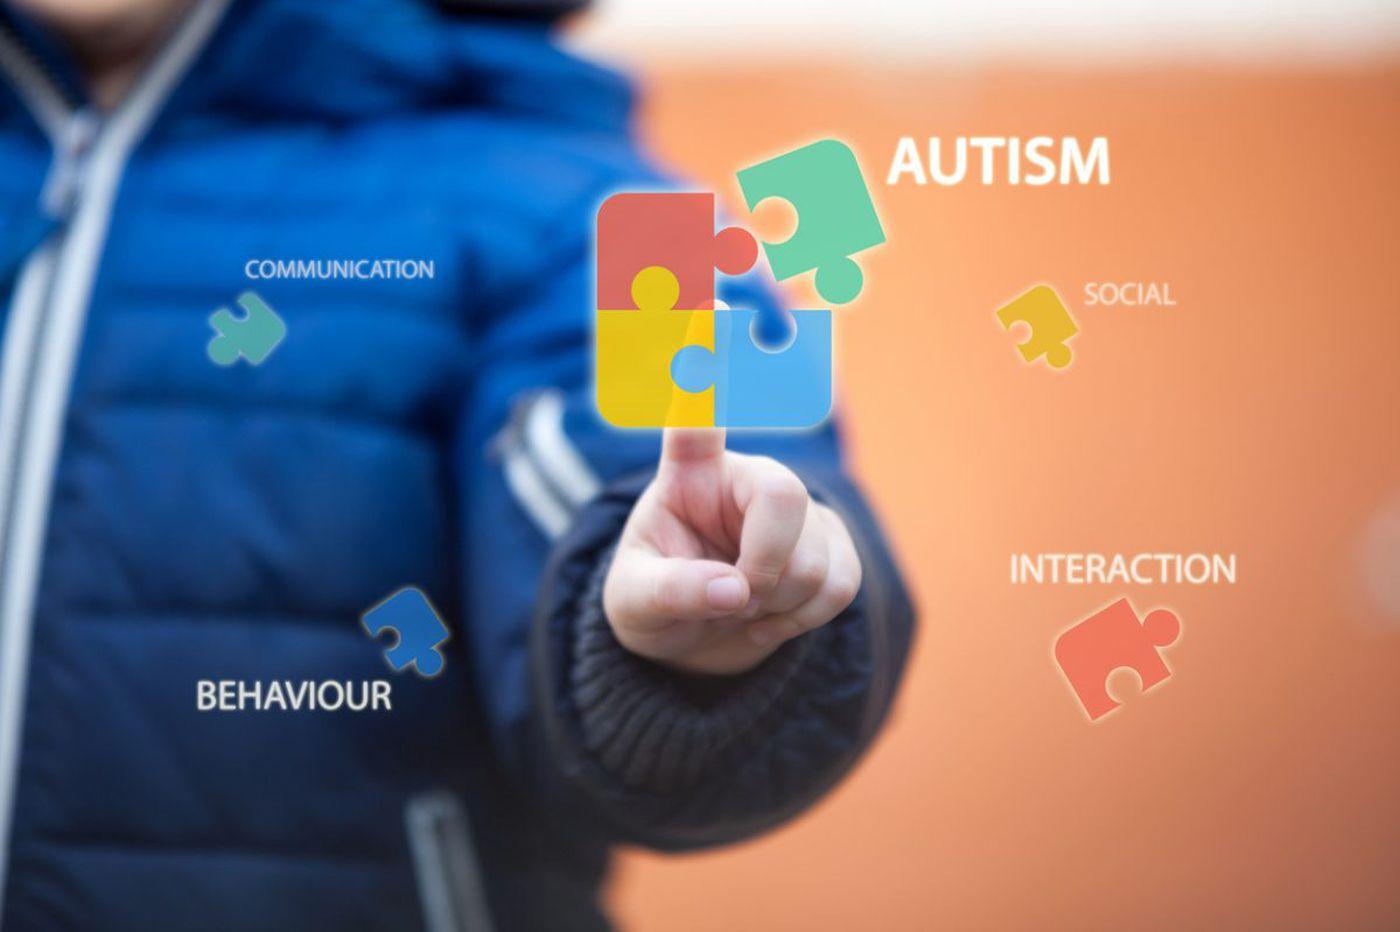 Public Health Management acquires Center for Autism